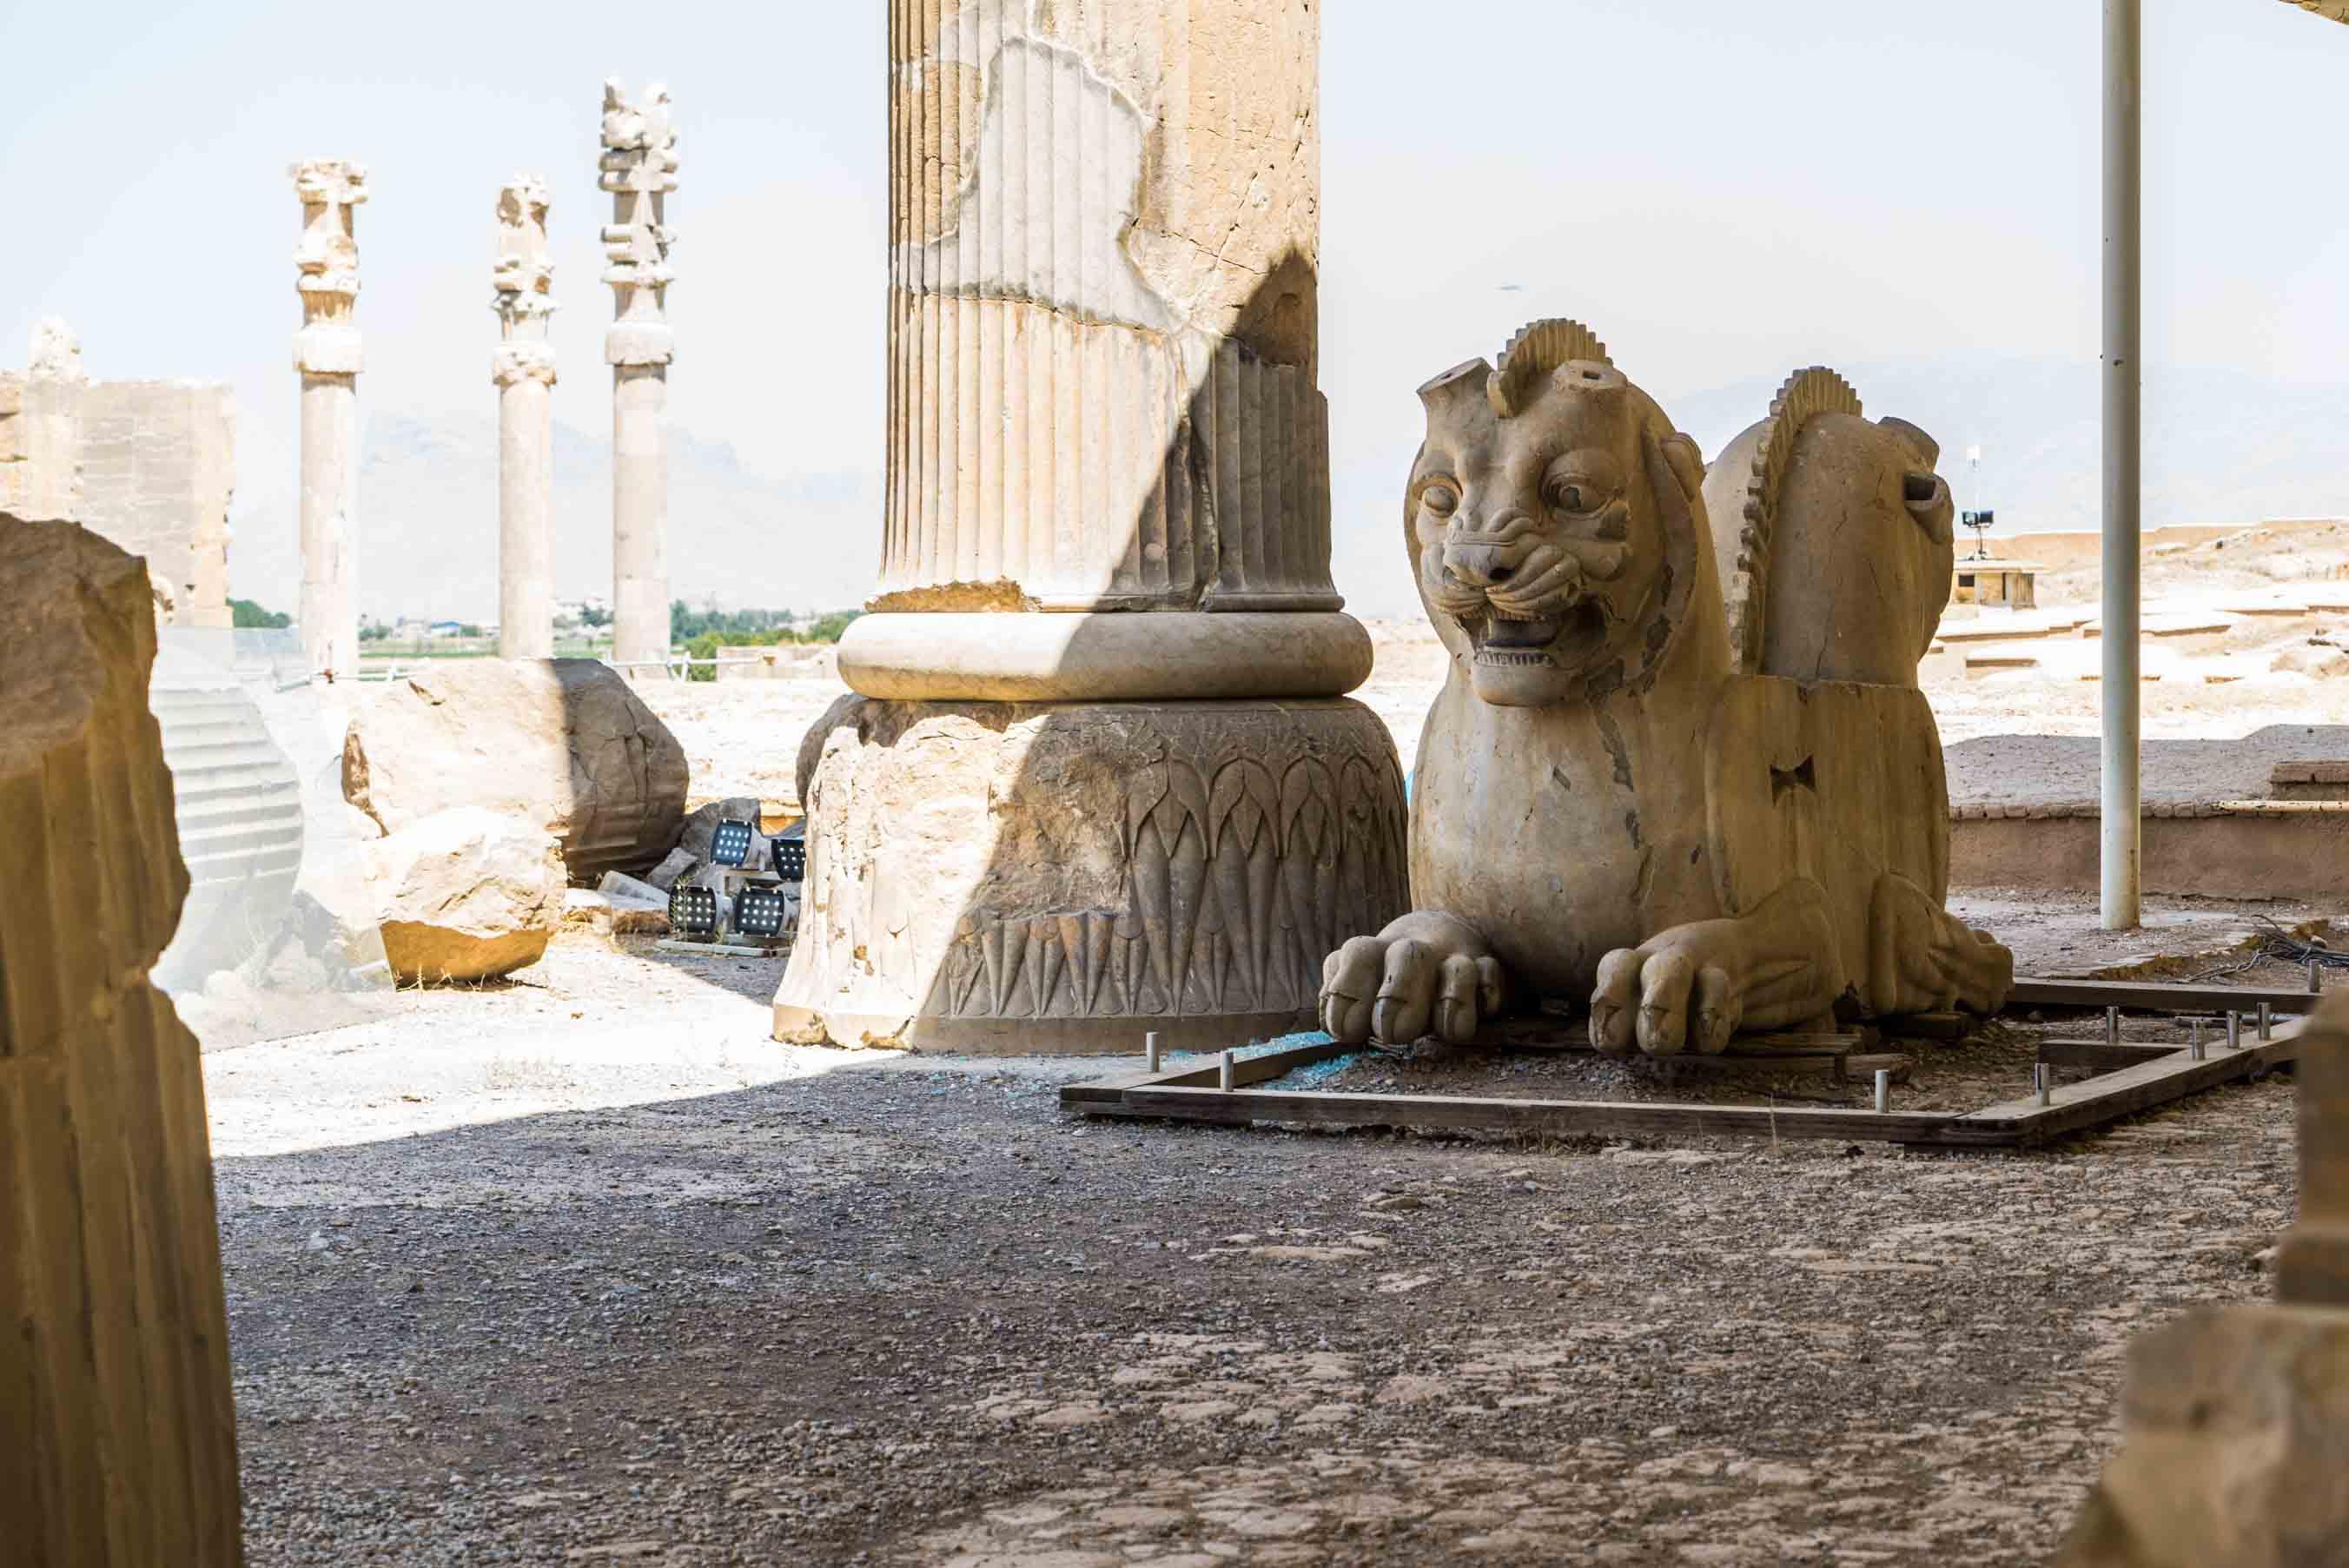 Persepolis Iran - Lion symbol of Persia